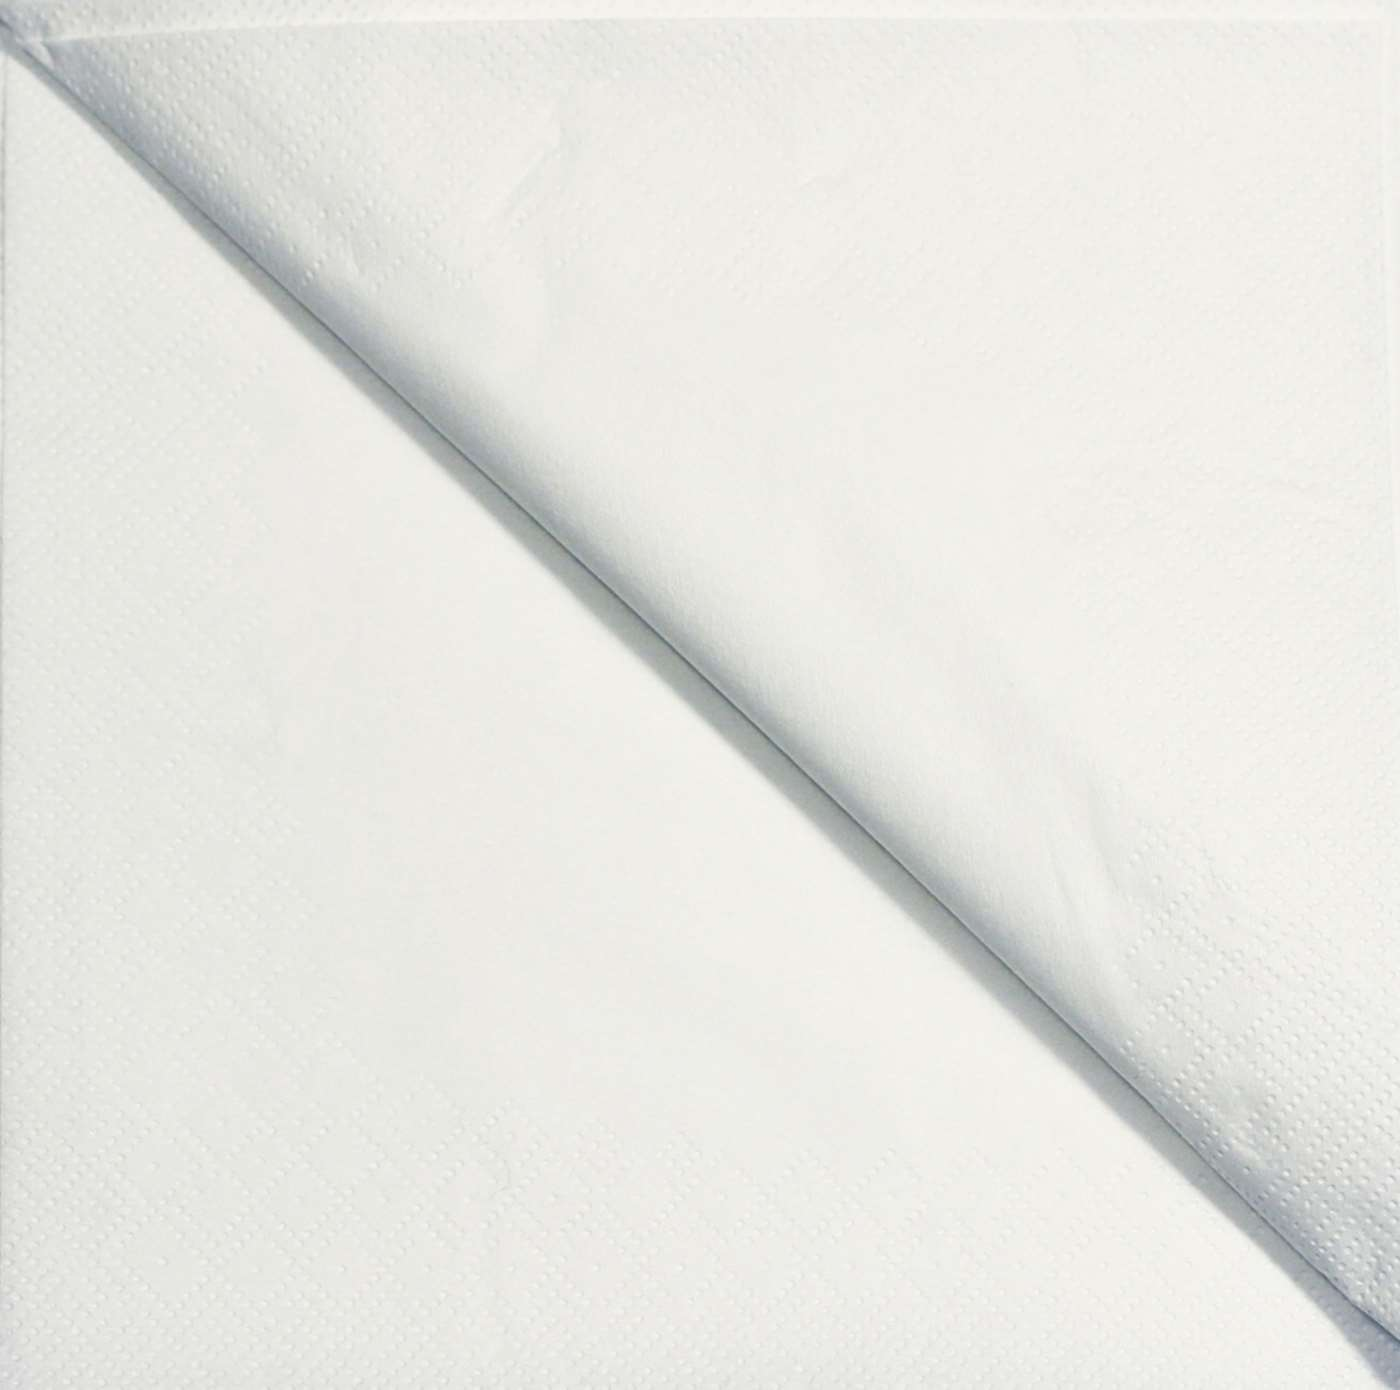 40cm 3 Ply White Napkin